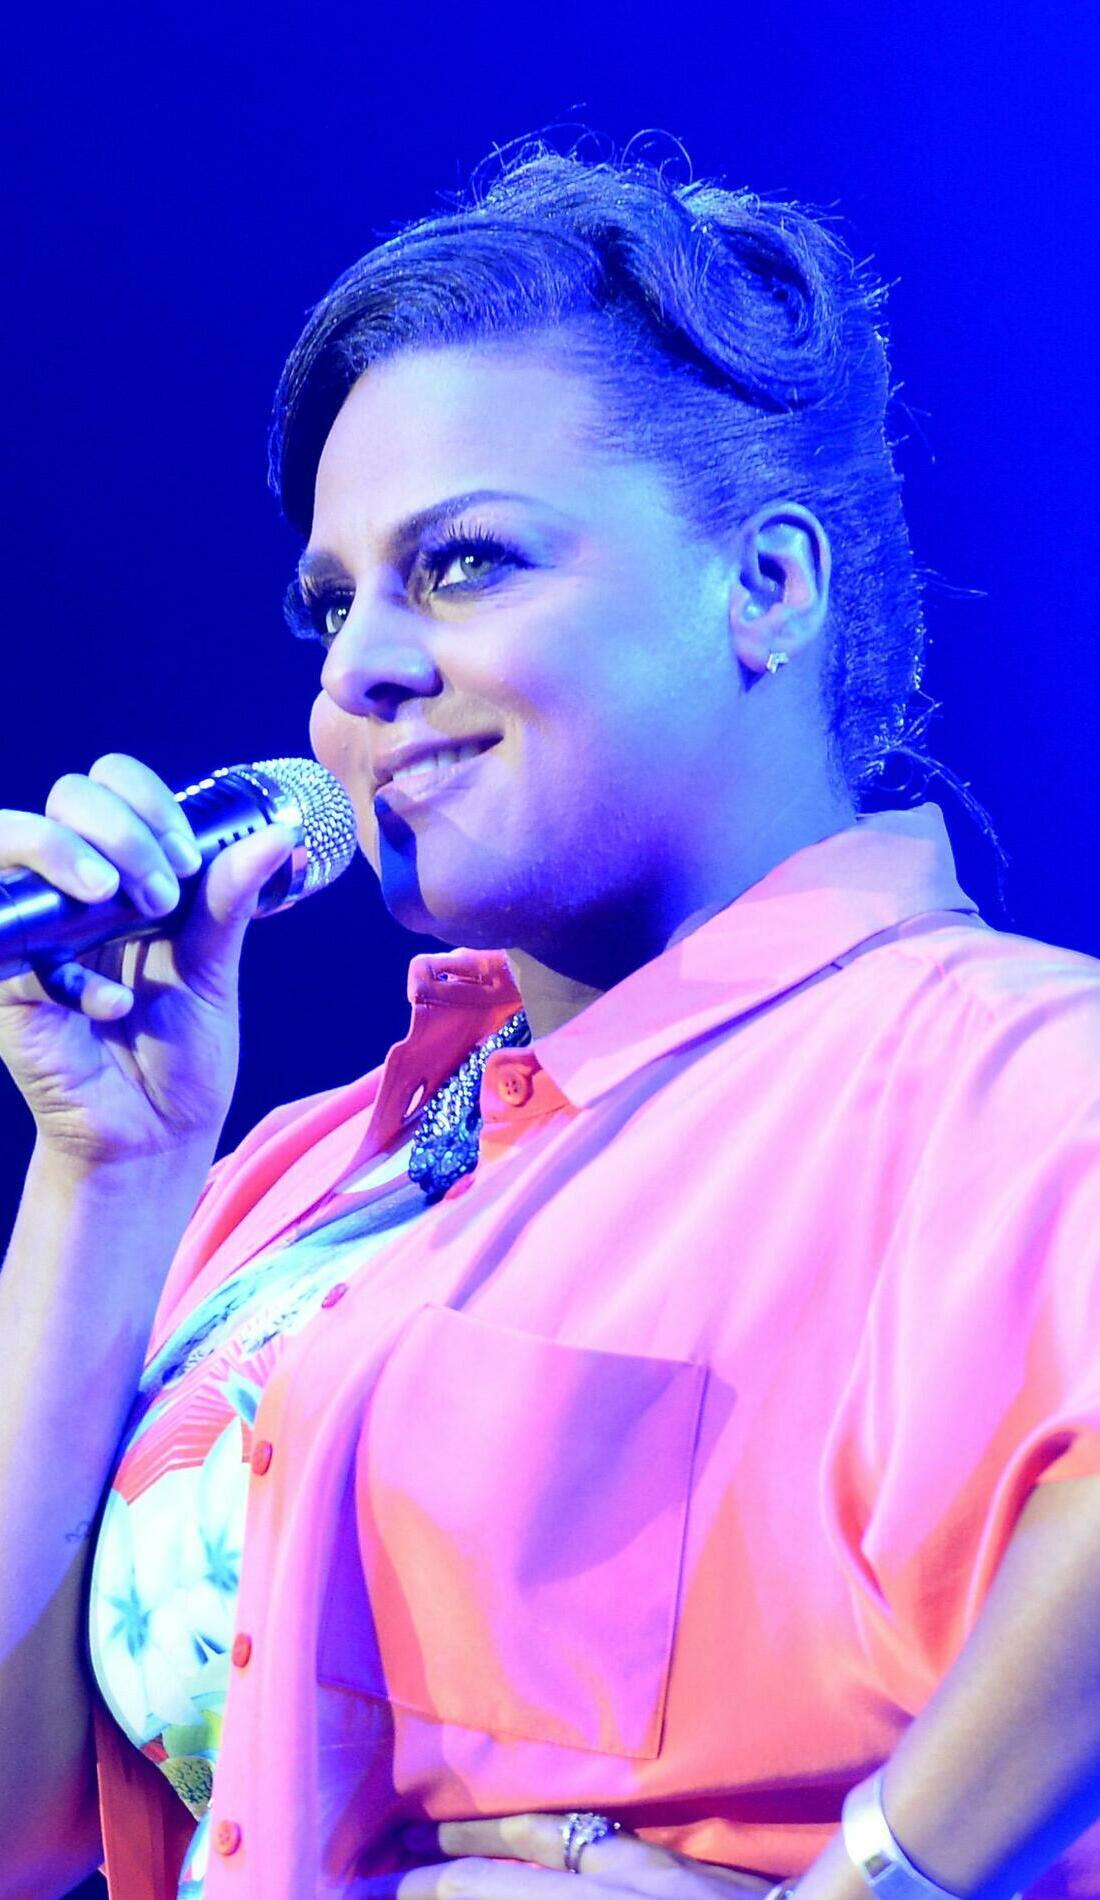 A Marsha Ambrosius live event